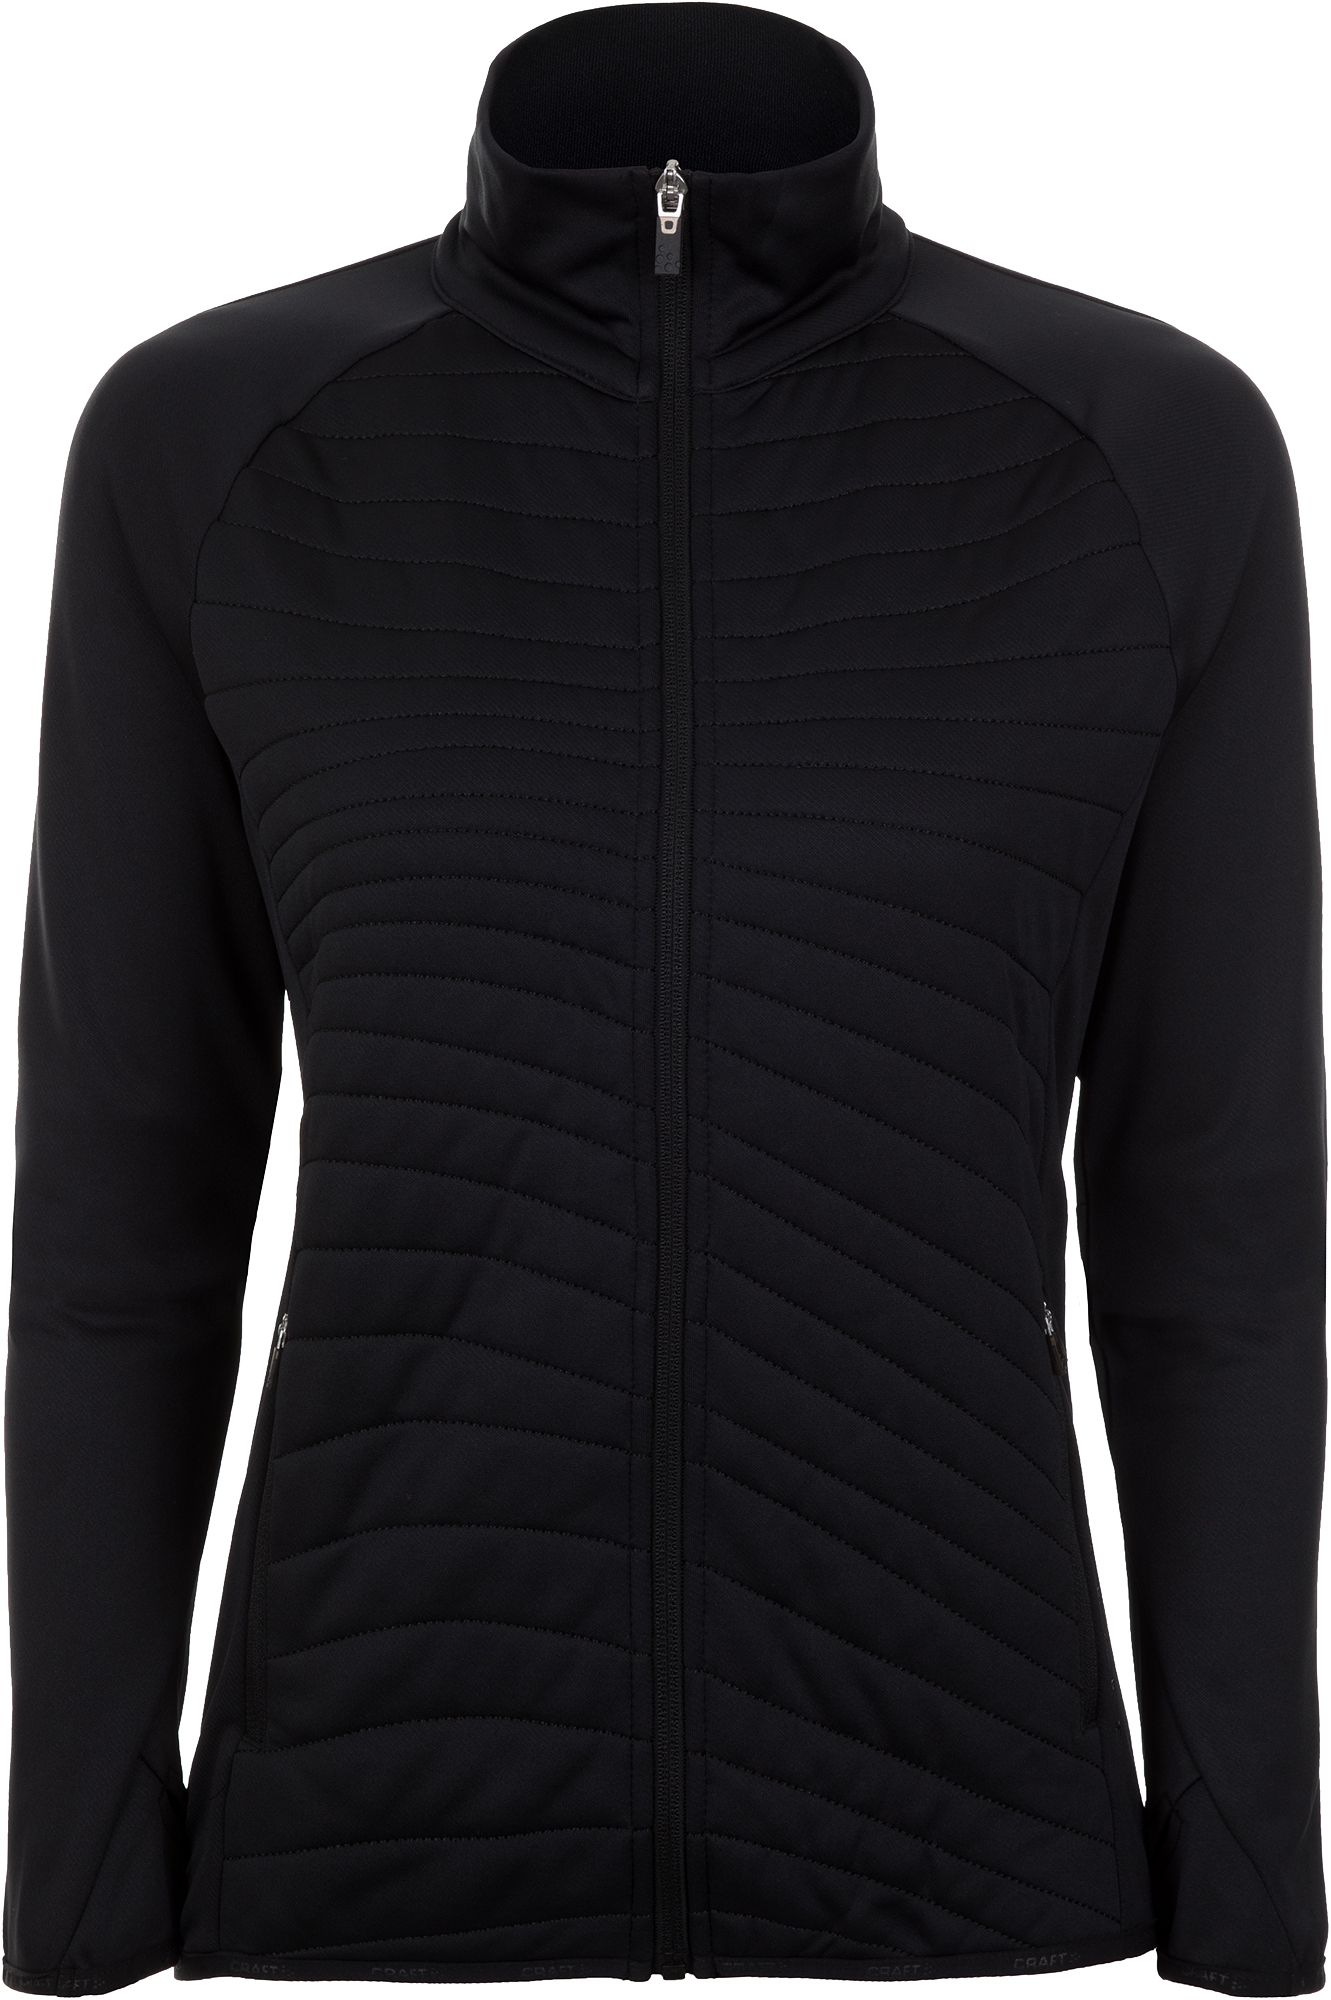 Craft Куртка женская Craft Breakaway Jersey Quilt, размер 46-48